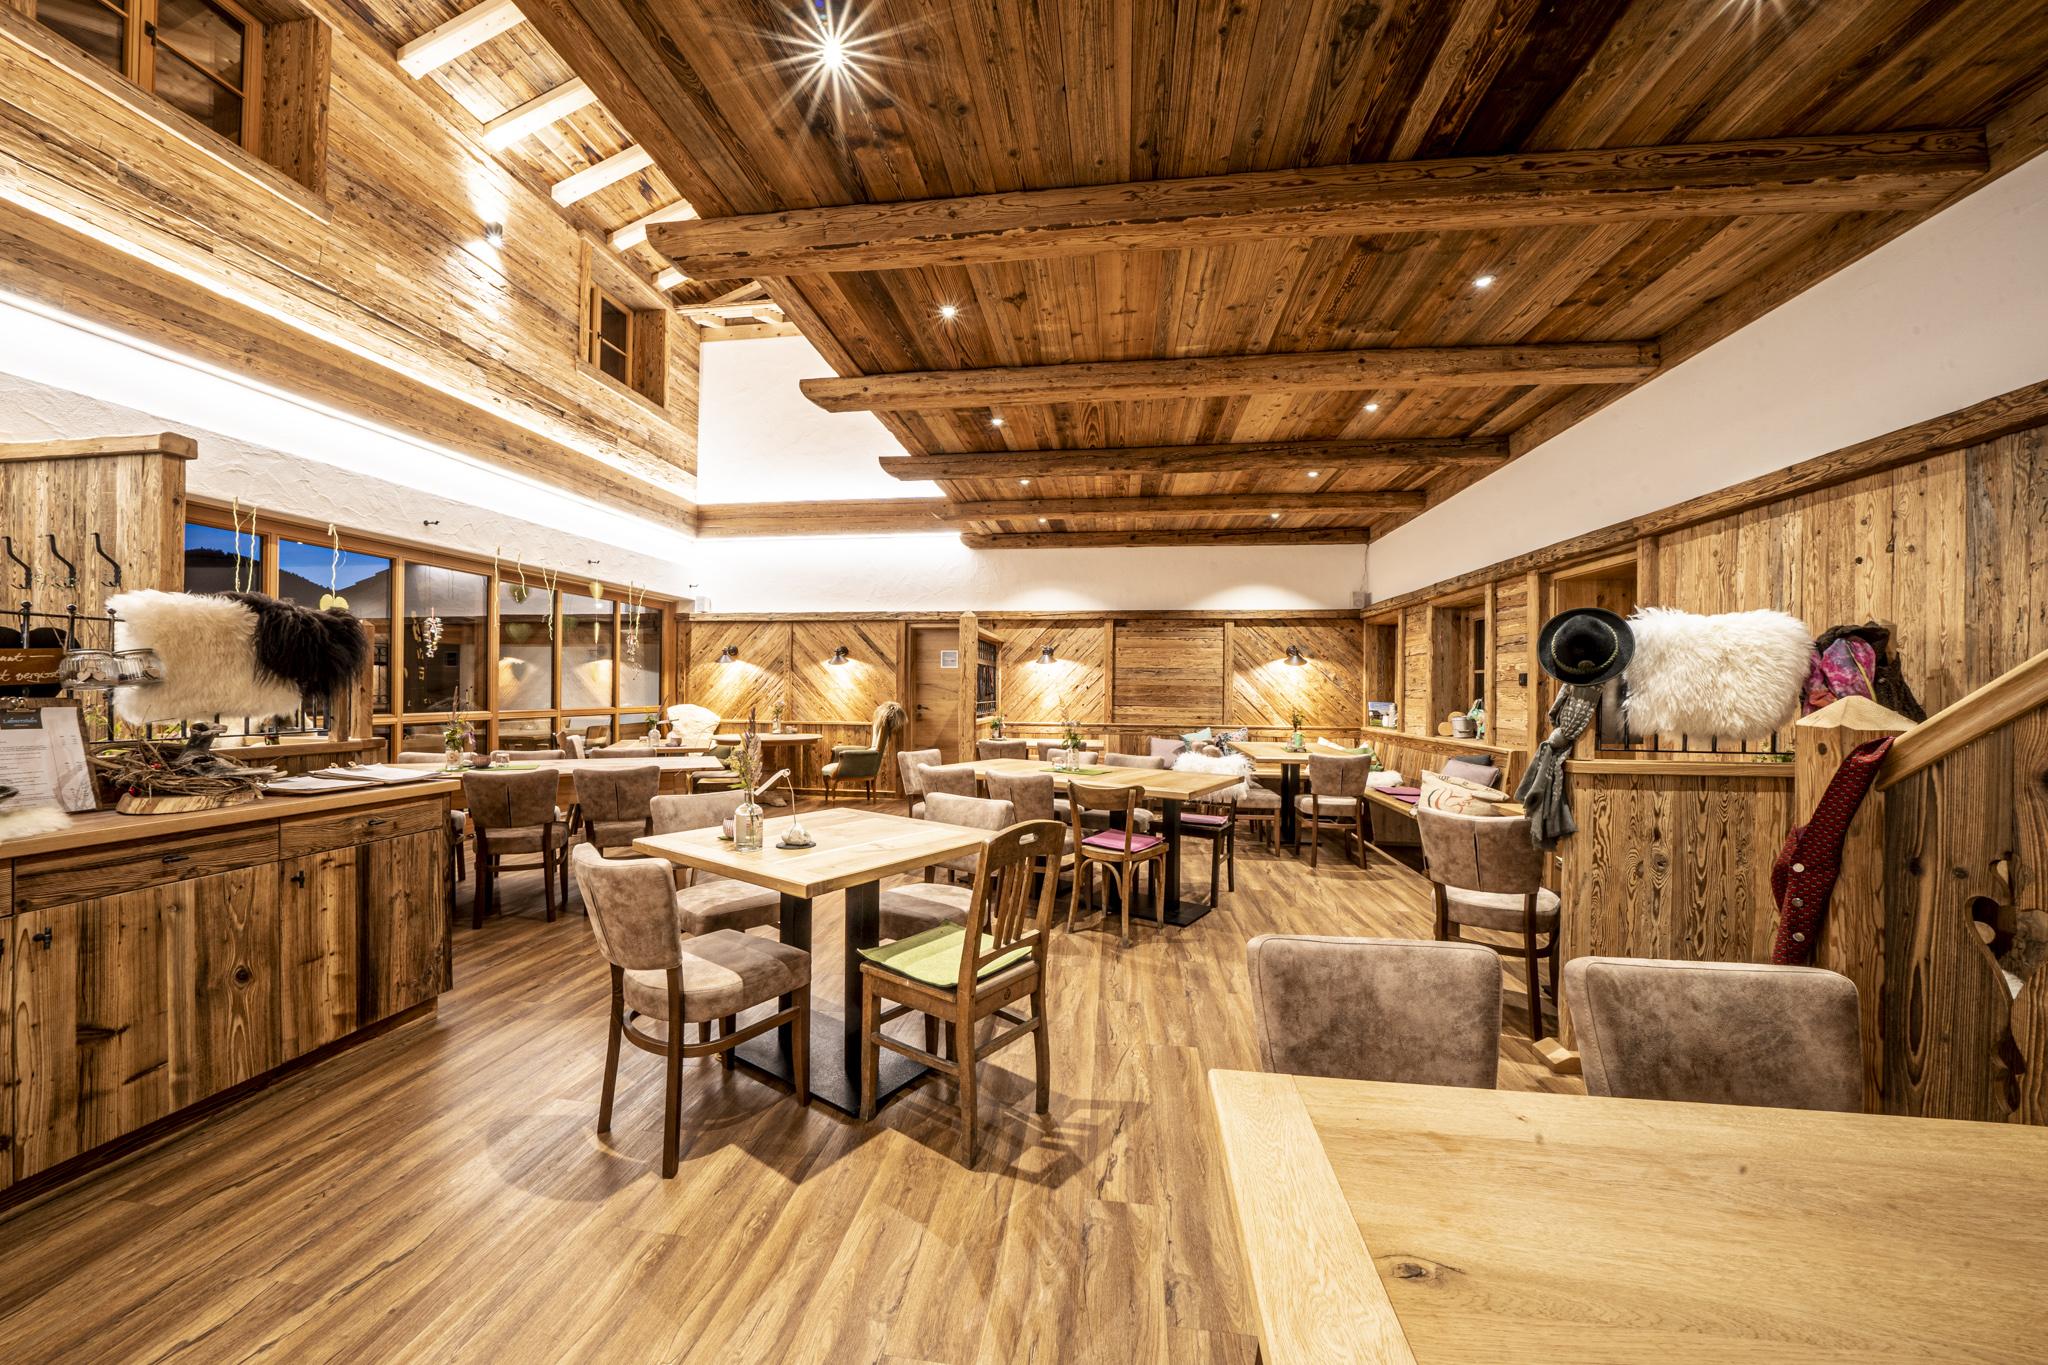 Restaurant Lahnerstubn. Foto: Wolfgang Kronwitter, www.windkinder.com